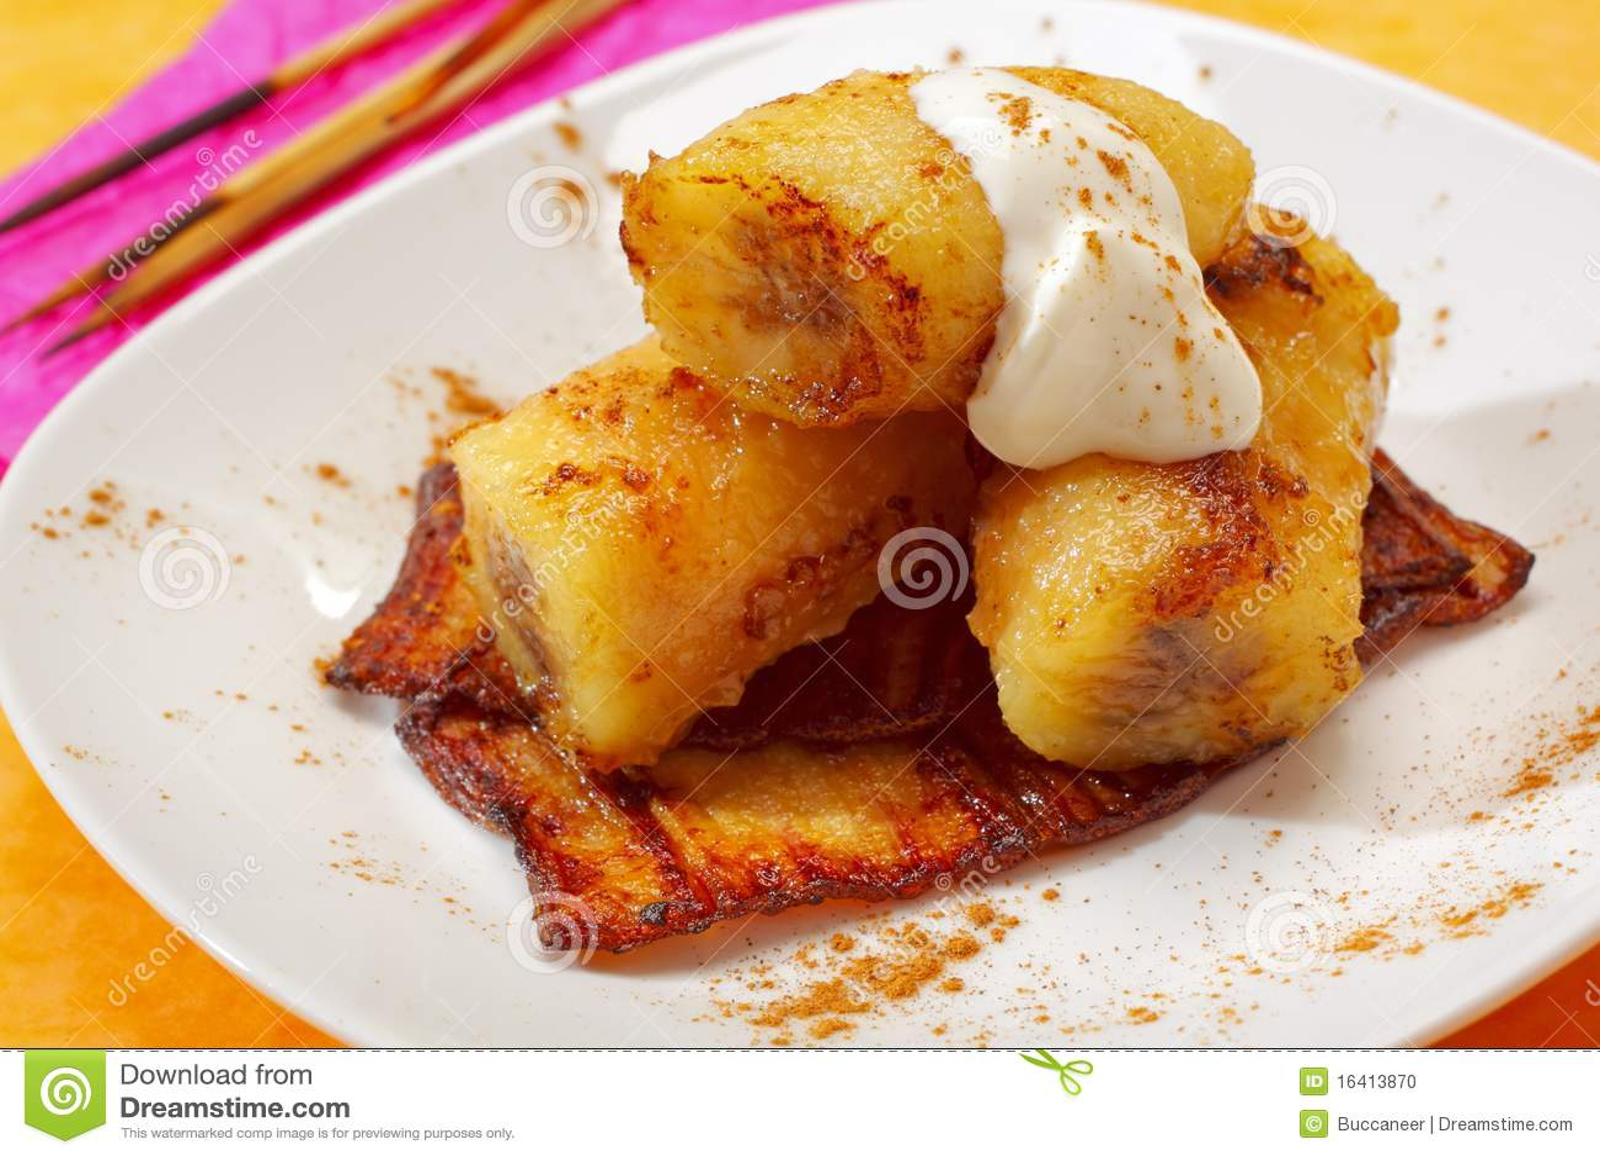 Banane caramellate cotte